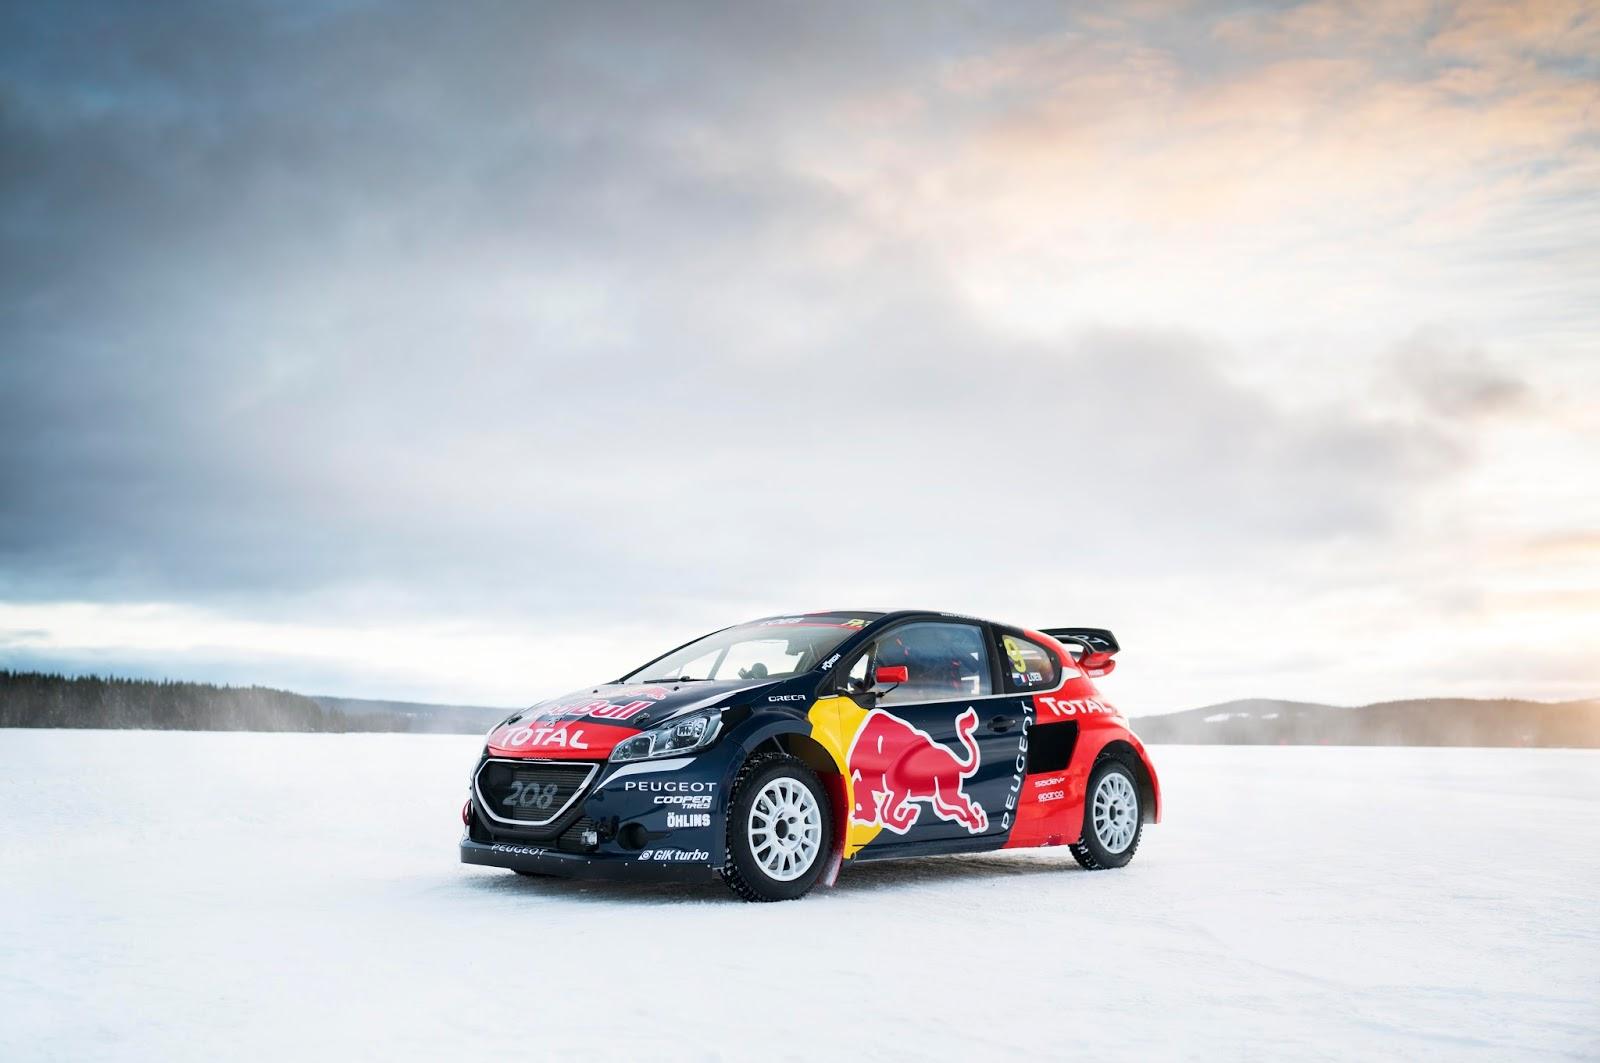 56d0766f241a8255B1255D Έτοιμα για μάχη τα PEUGEOT 208 WRX, έτοιμος και ο Sébastien Loeb για το World RX! Hansen Motorsport, Peugeot, PEUGEOT 208 WRX, Peugeot Sport, Rally, Rallycross, videos, World RX, zblog